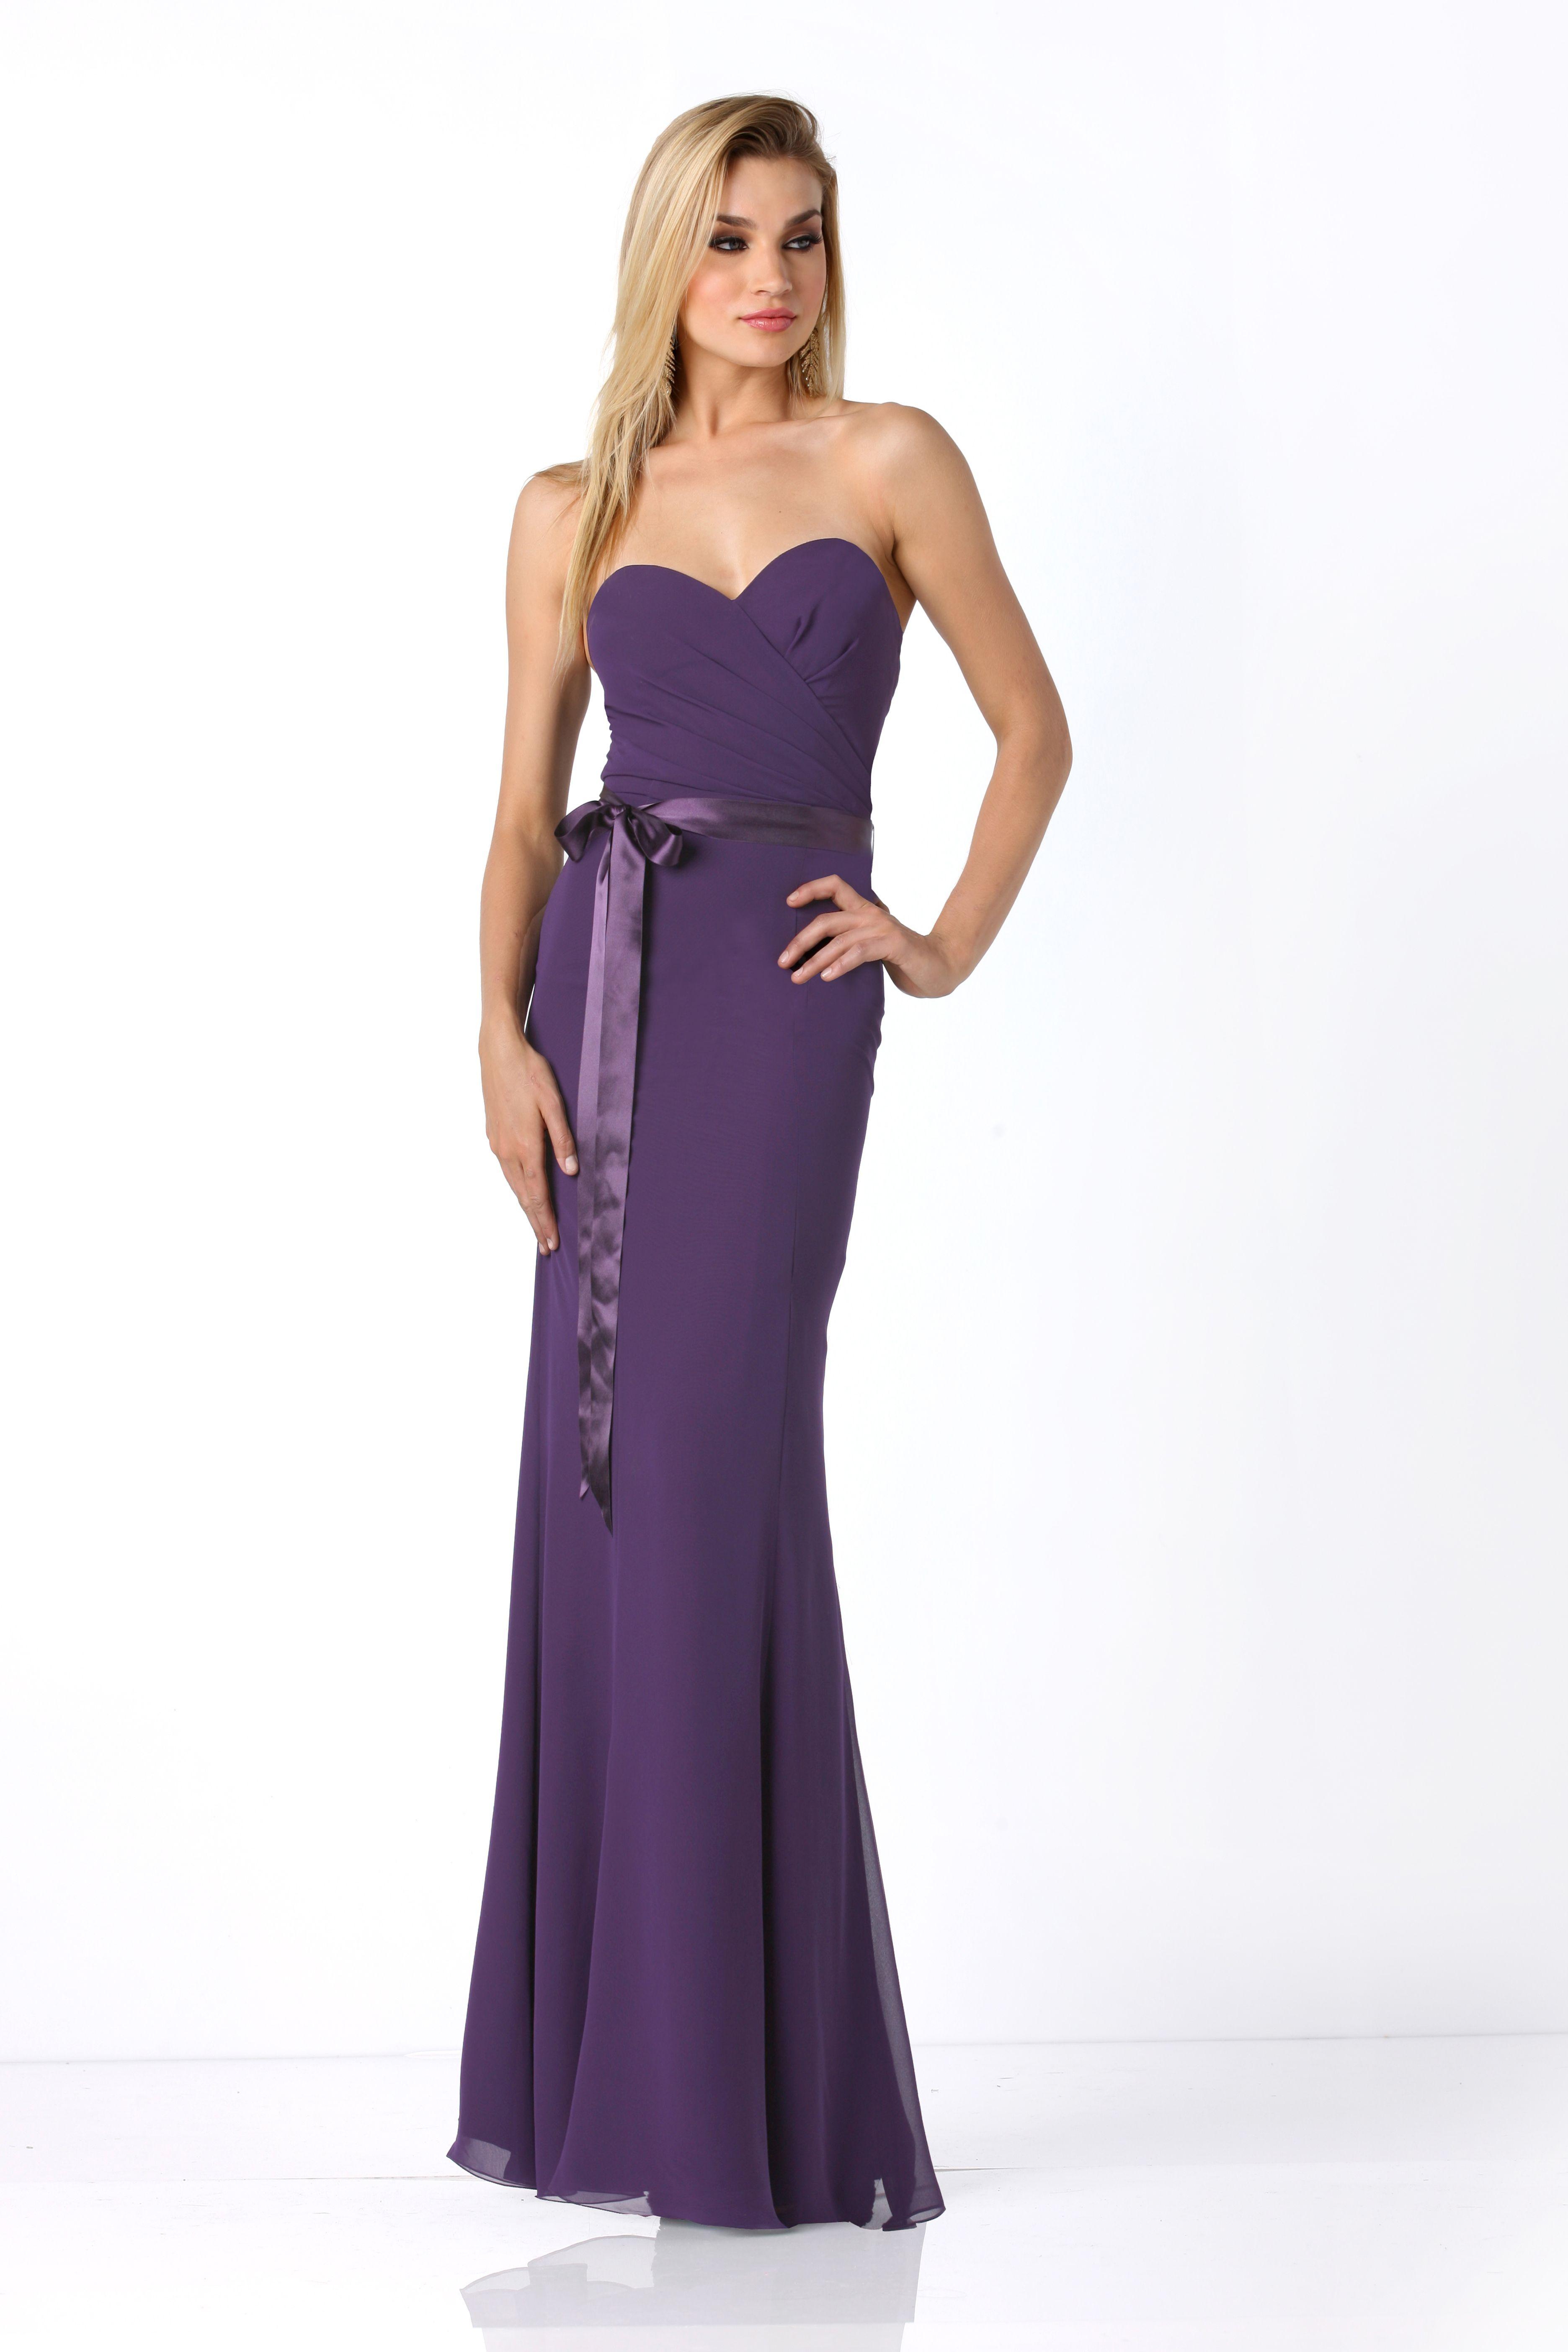 Long purple bridesmaid dresses from impressionbride wedding